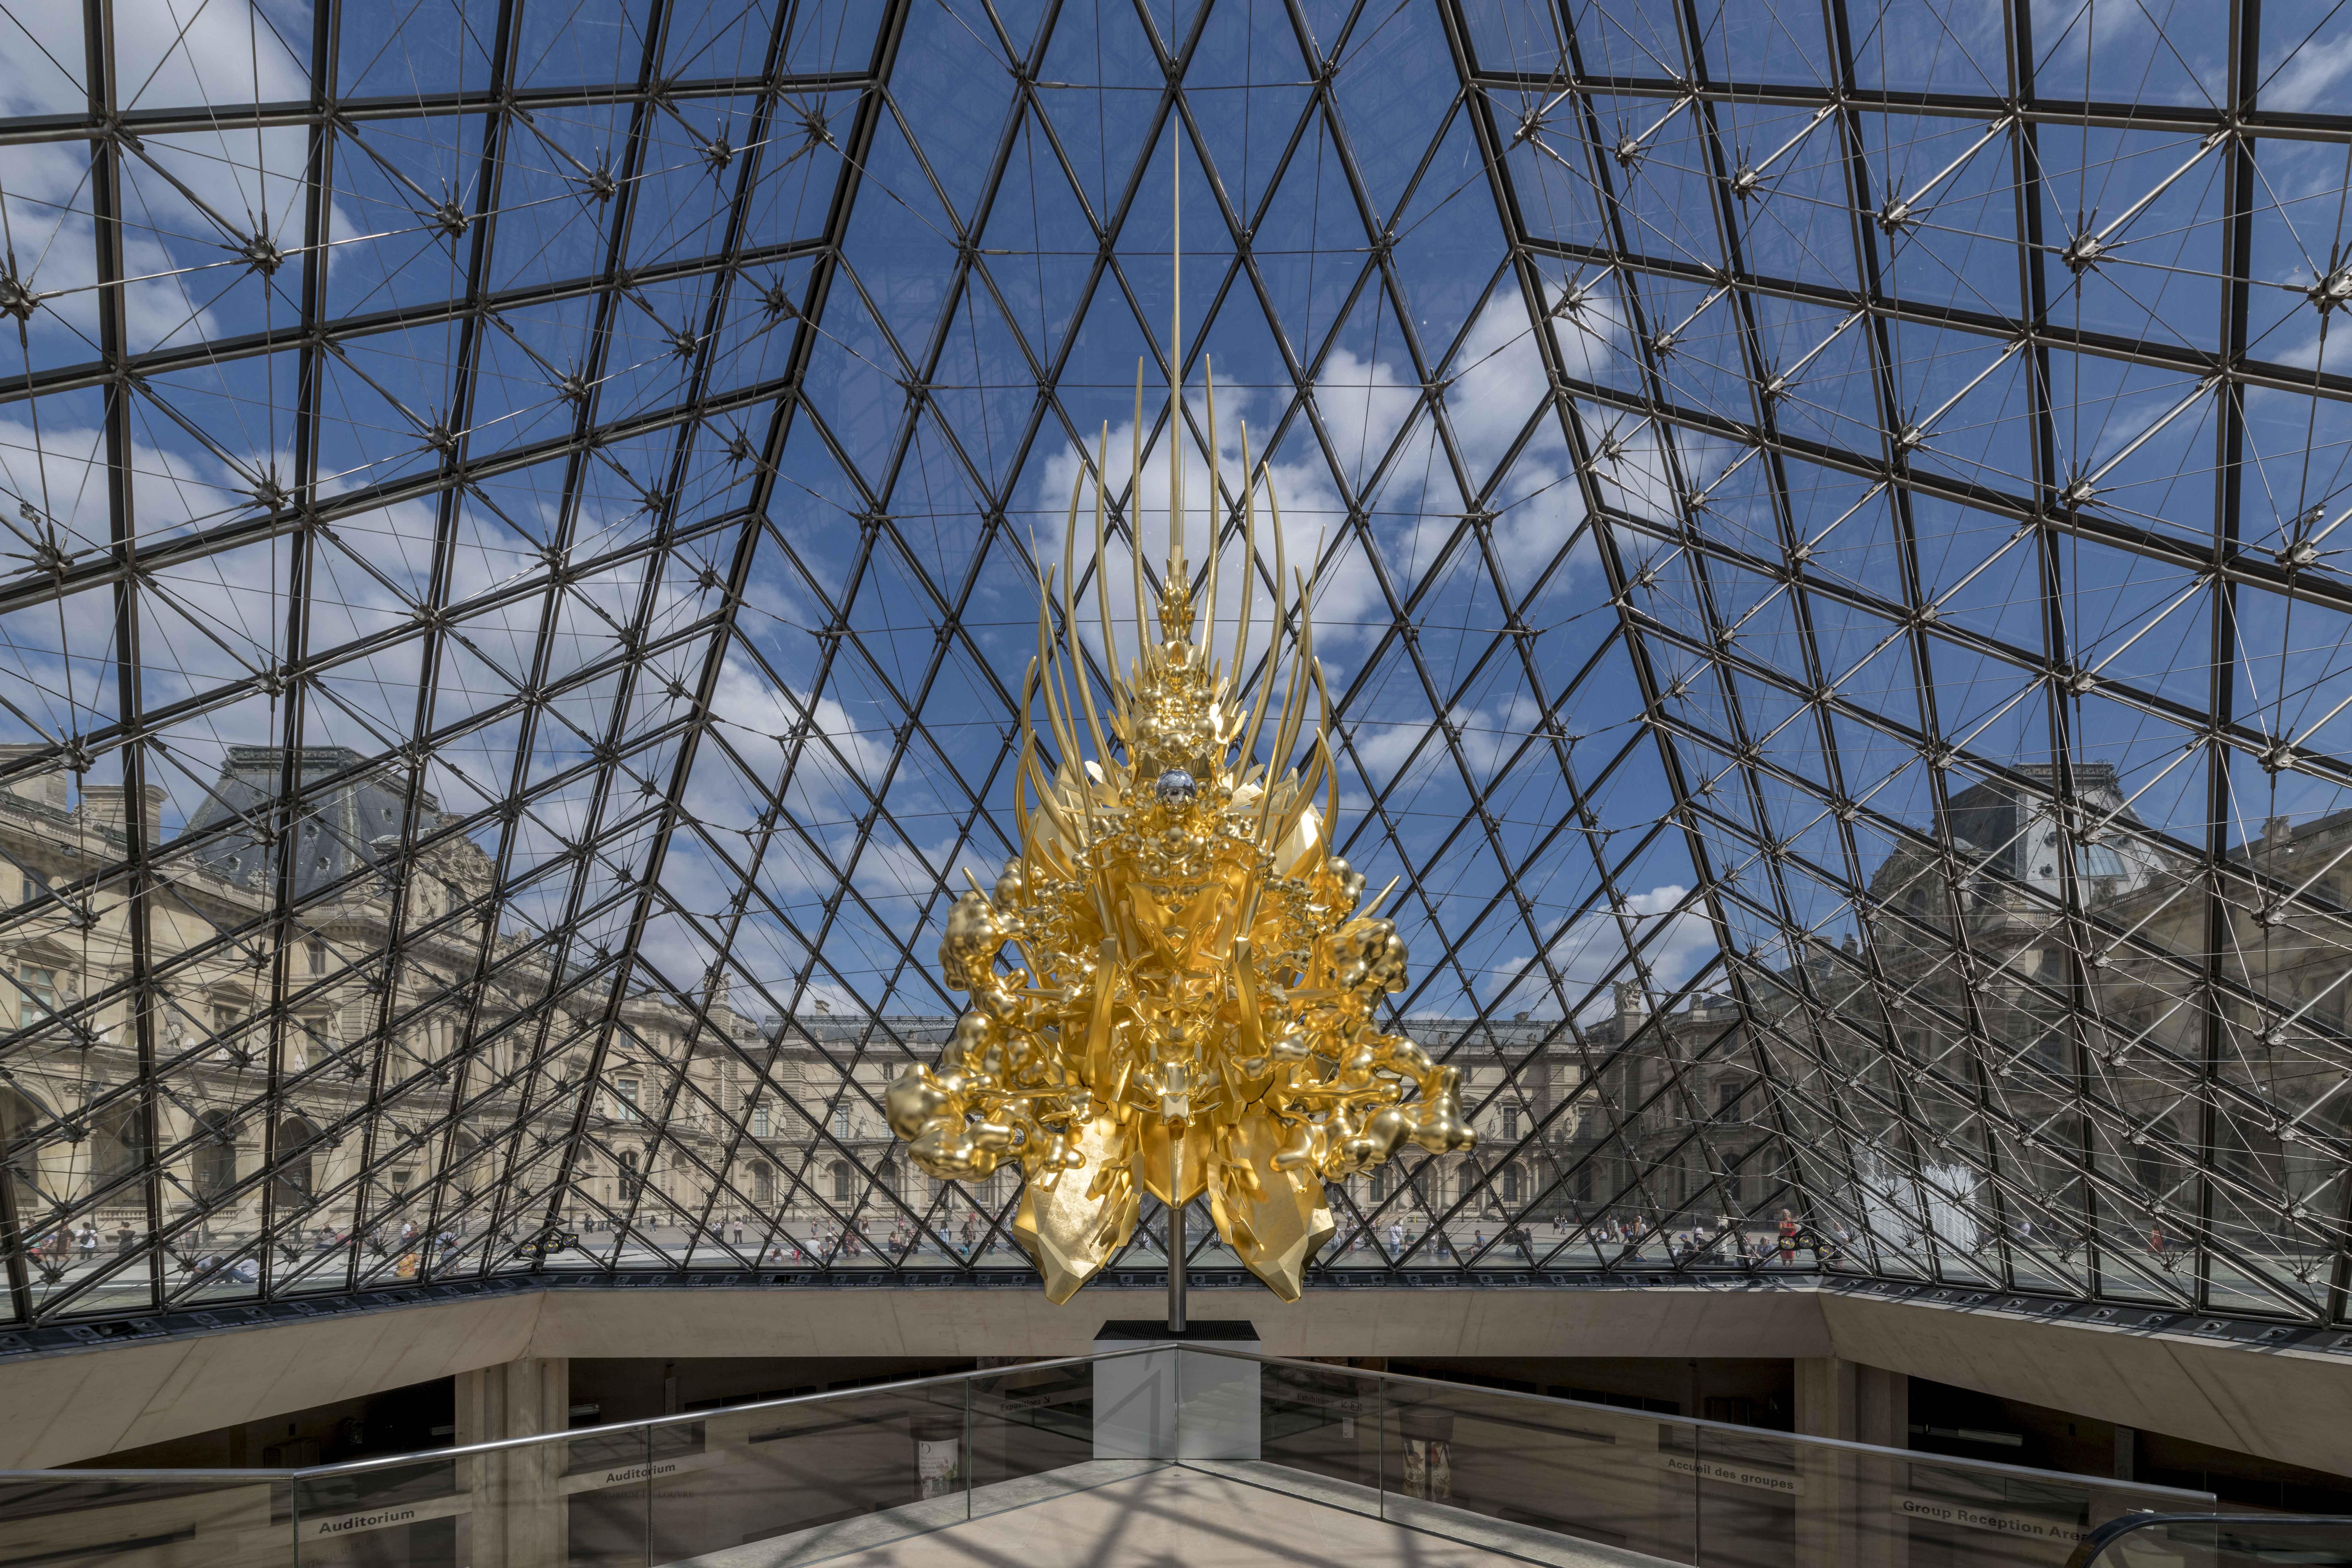 """Throne"" sous la pyramide du Louvre, Kohei Nawa, 2018. Photo par Nobutada Omote Sandwich."